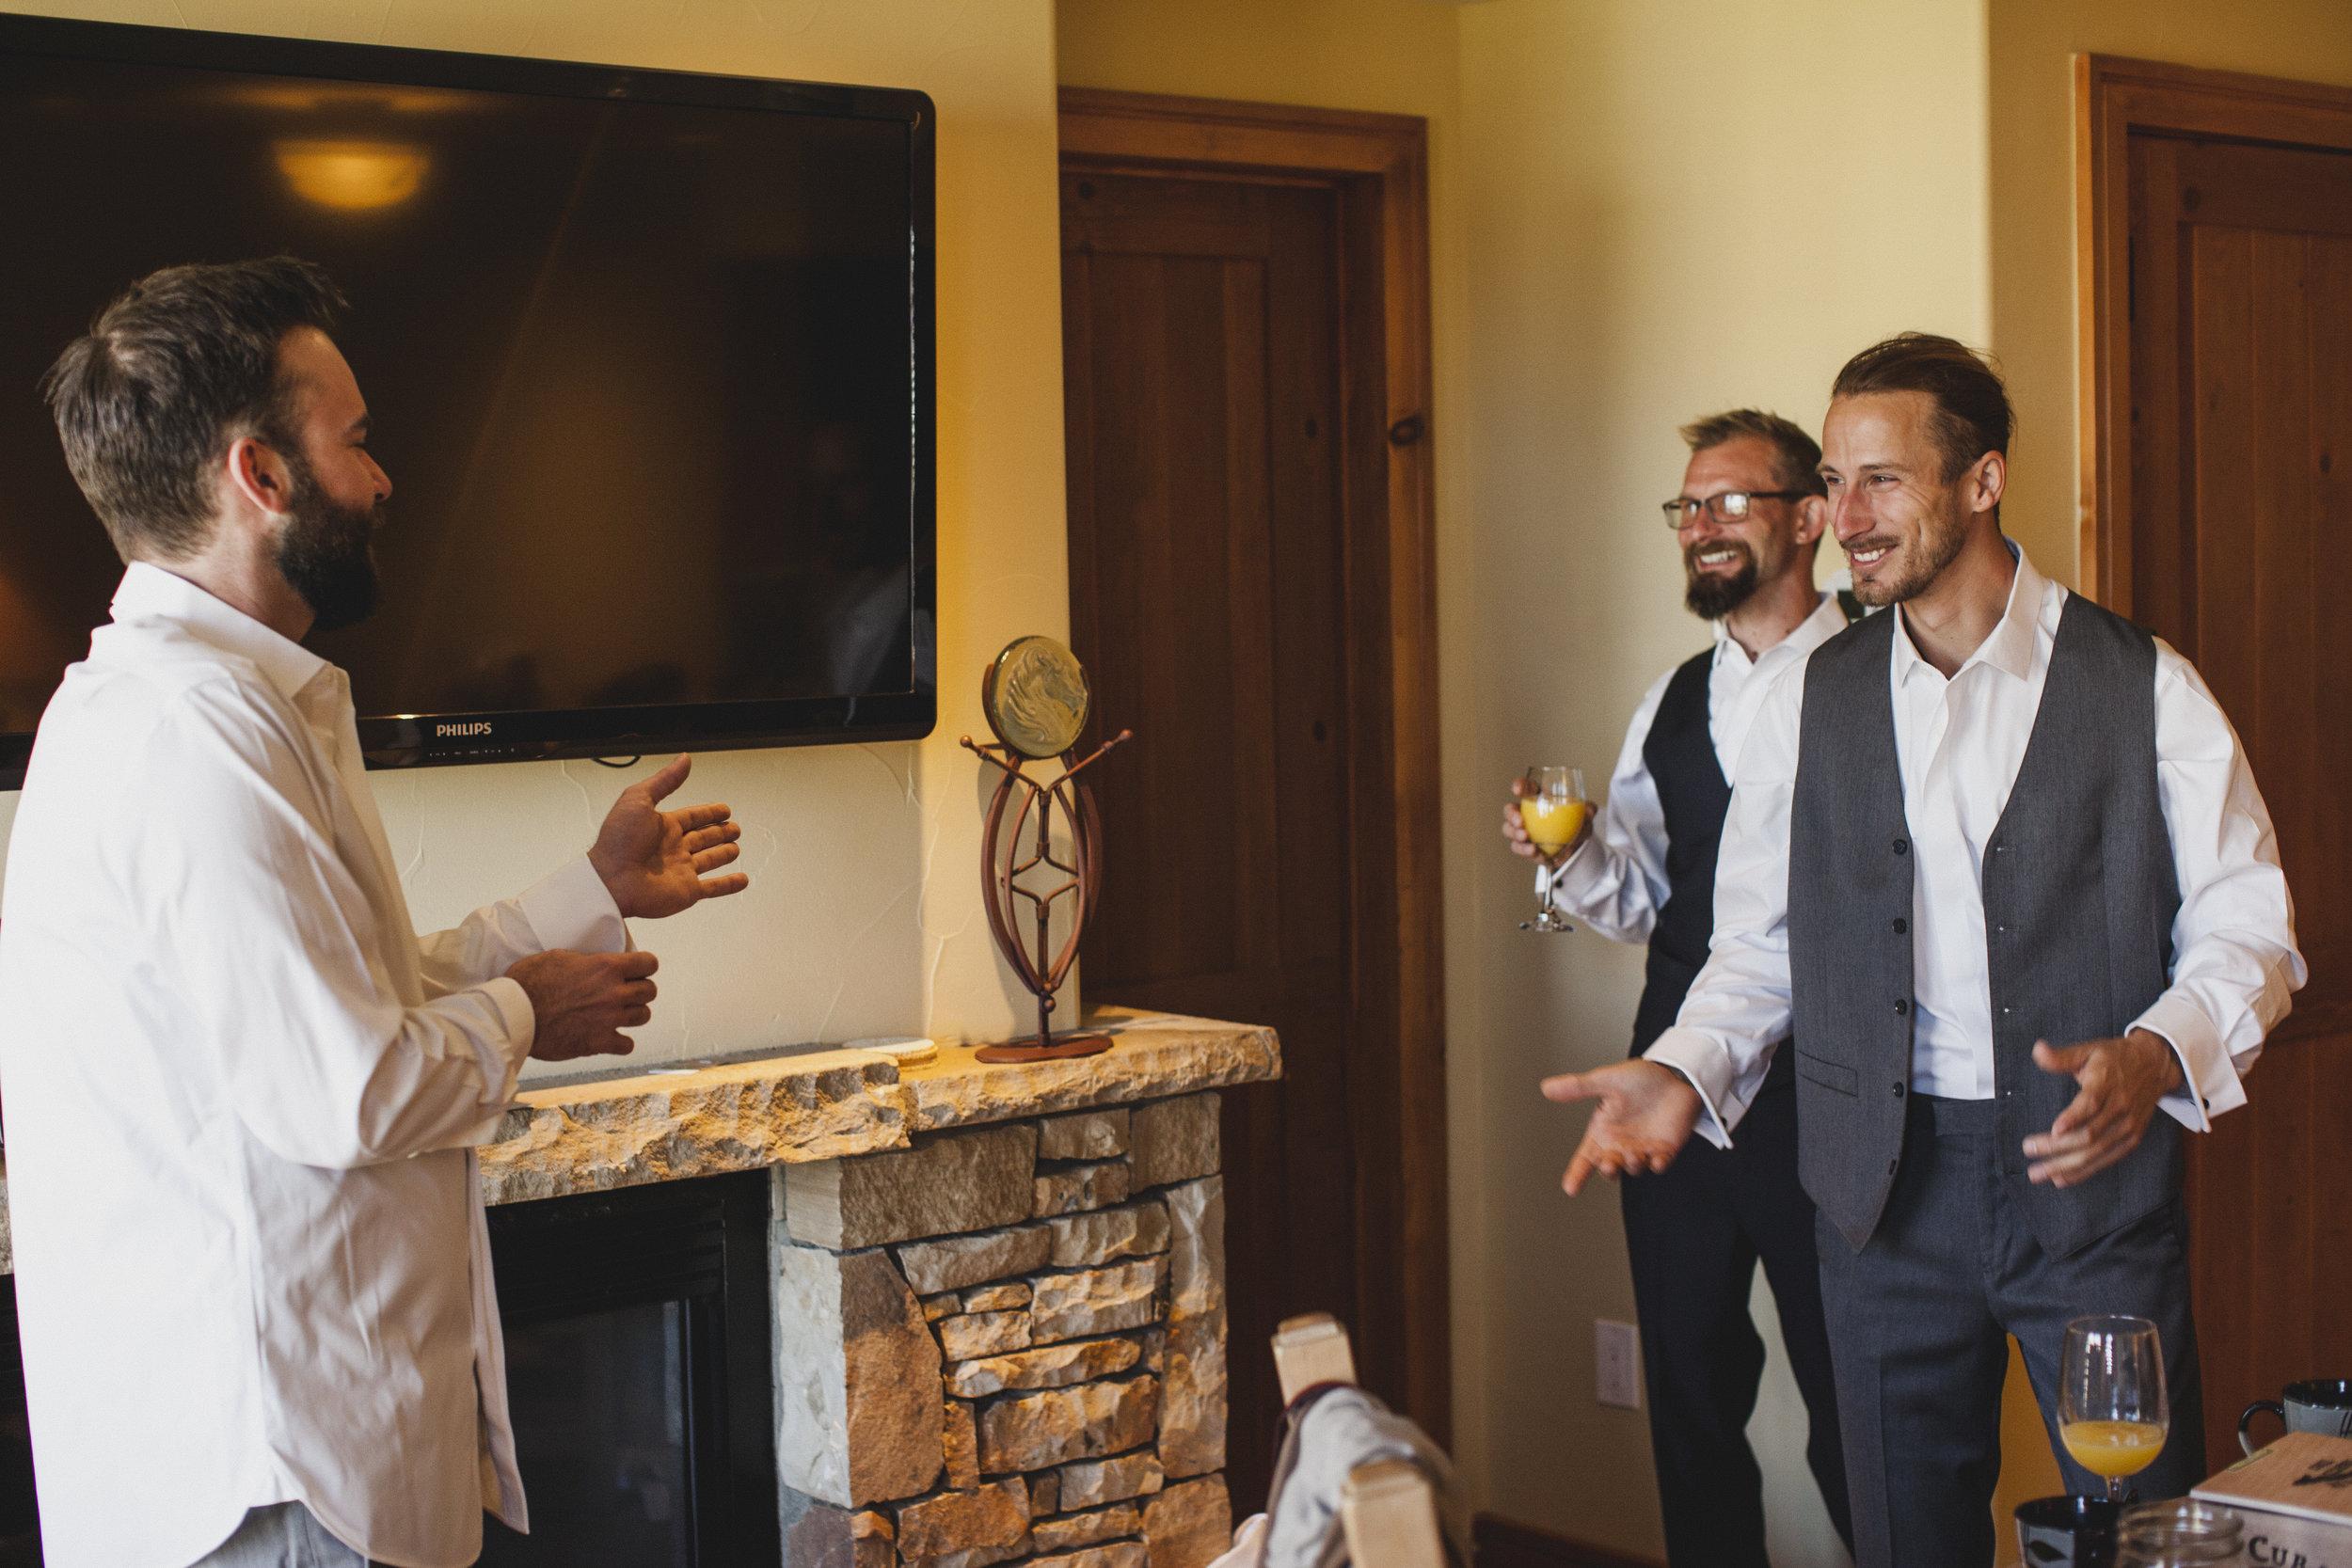 NE-LeahandAshtonphotography-Telluride-Wedding-Photography-6251.jpg